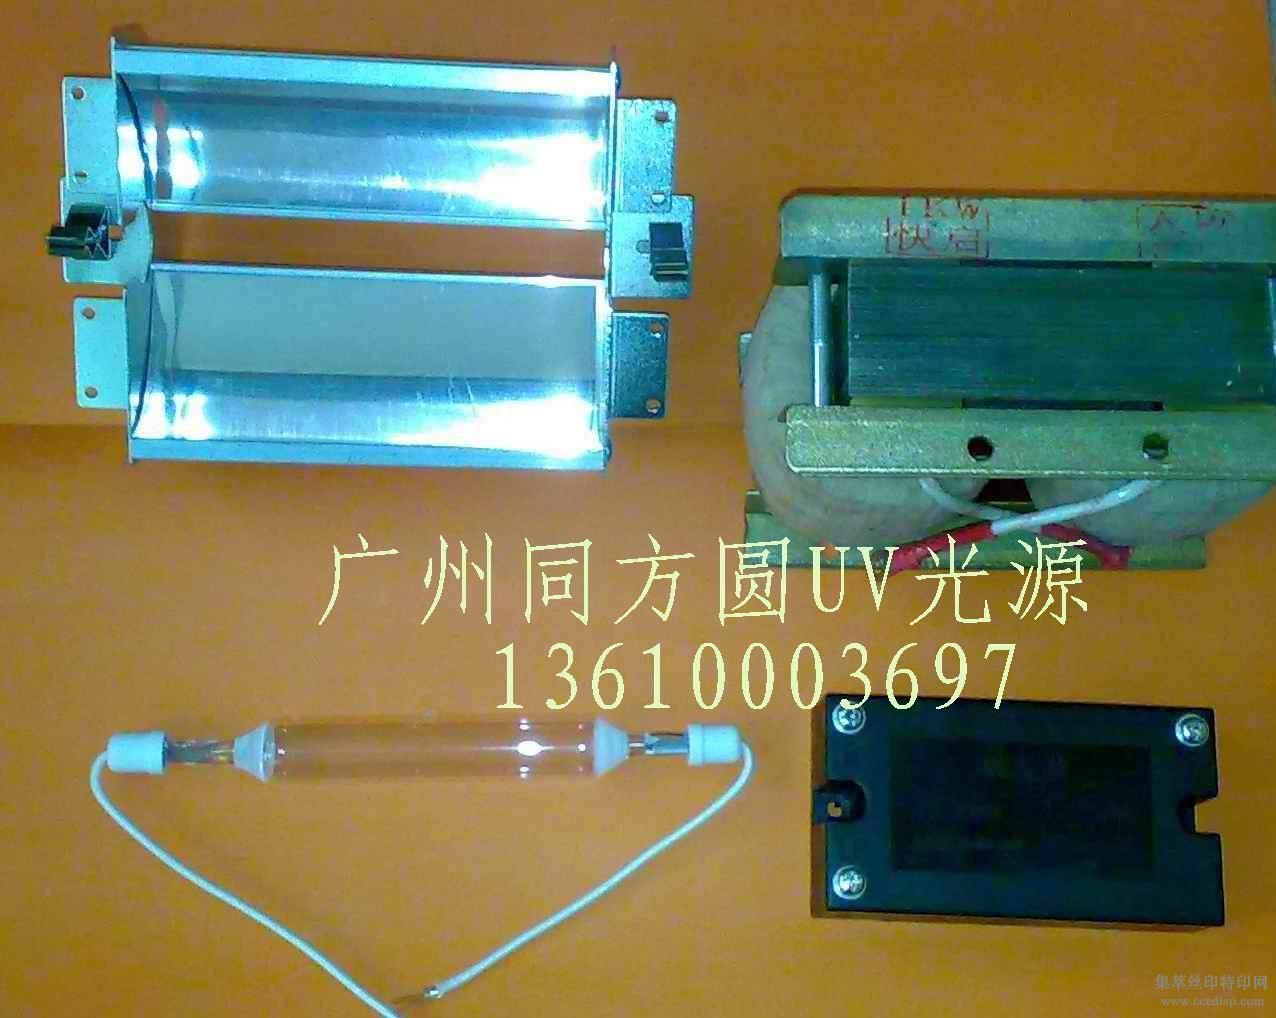 uv灯 紫外线uv固化灯配套设备镇流器